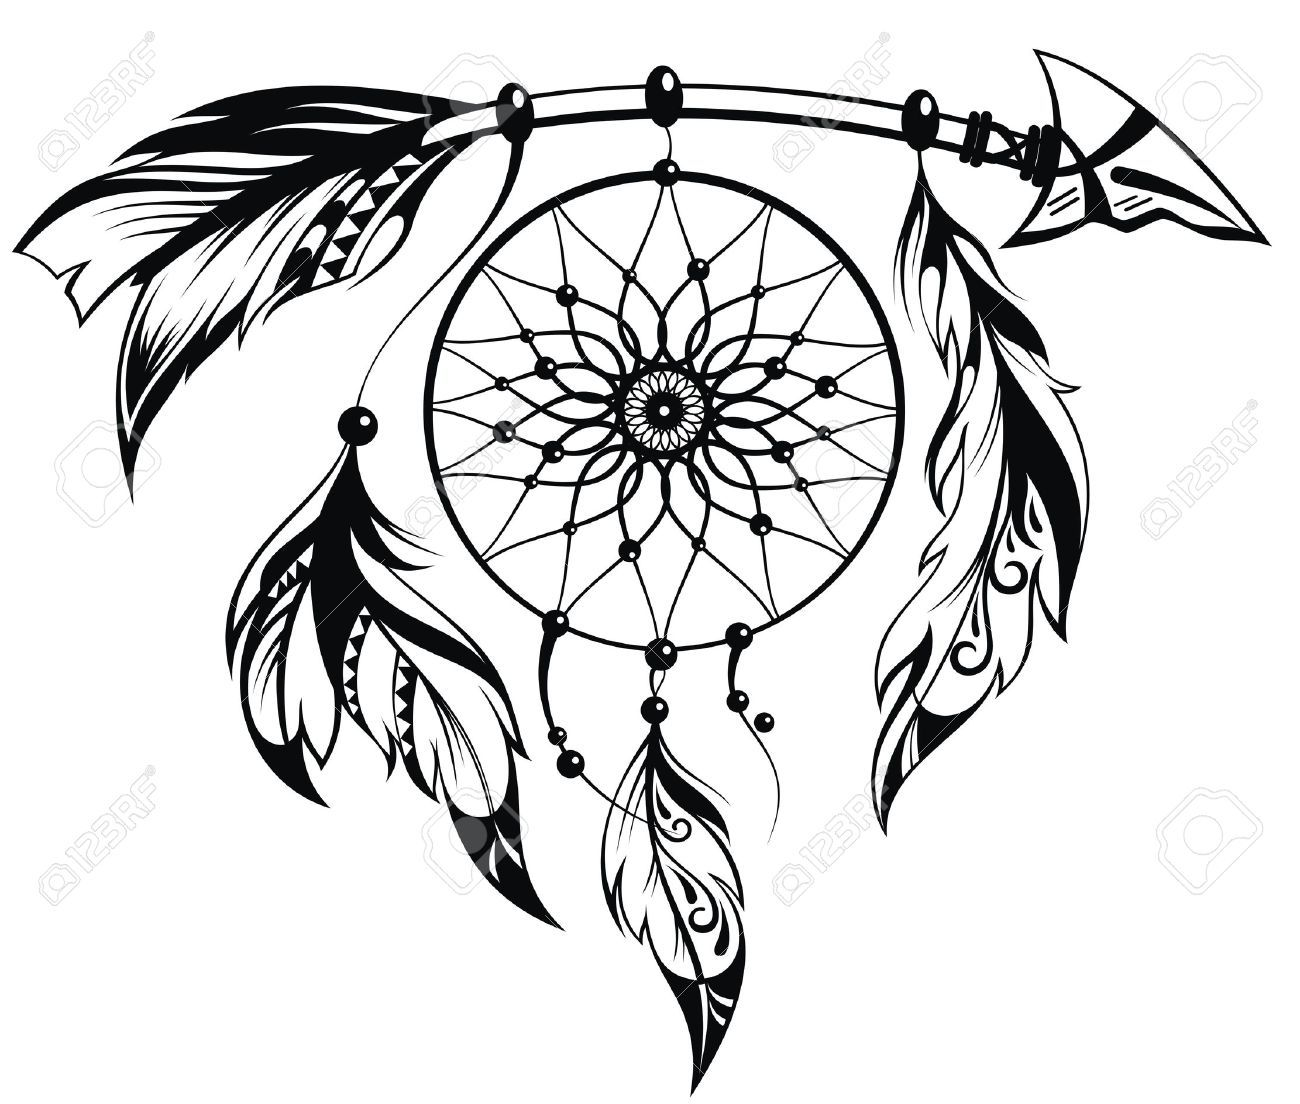 apache warrior tattoo dream catcher tattoo pinterest warrior tattoos tattoo and tatting. Black Bedroom Furniture Sets. Home Design Ideas